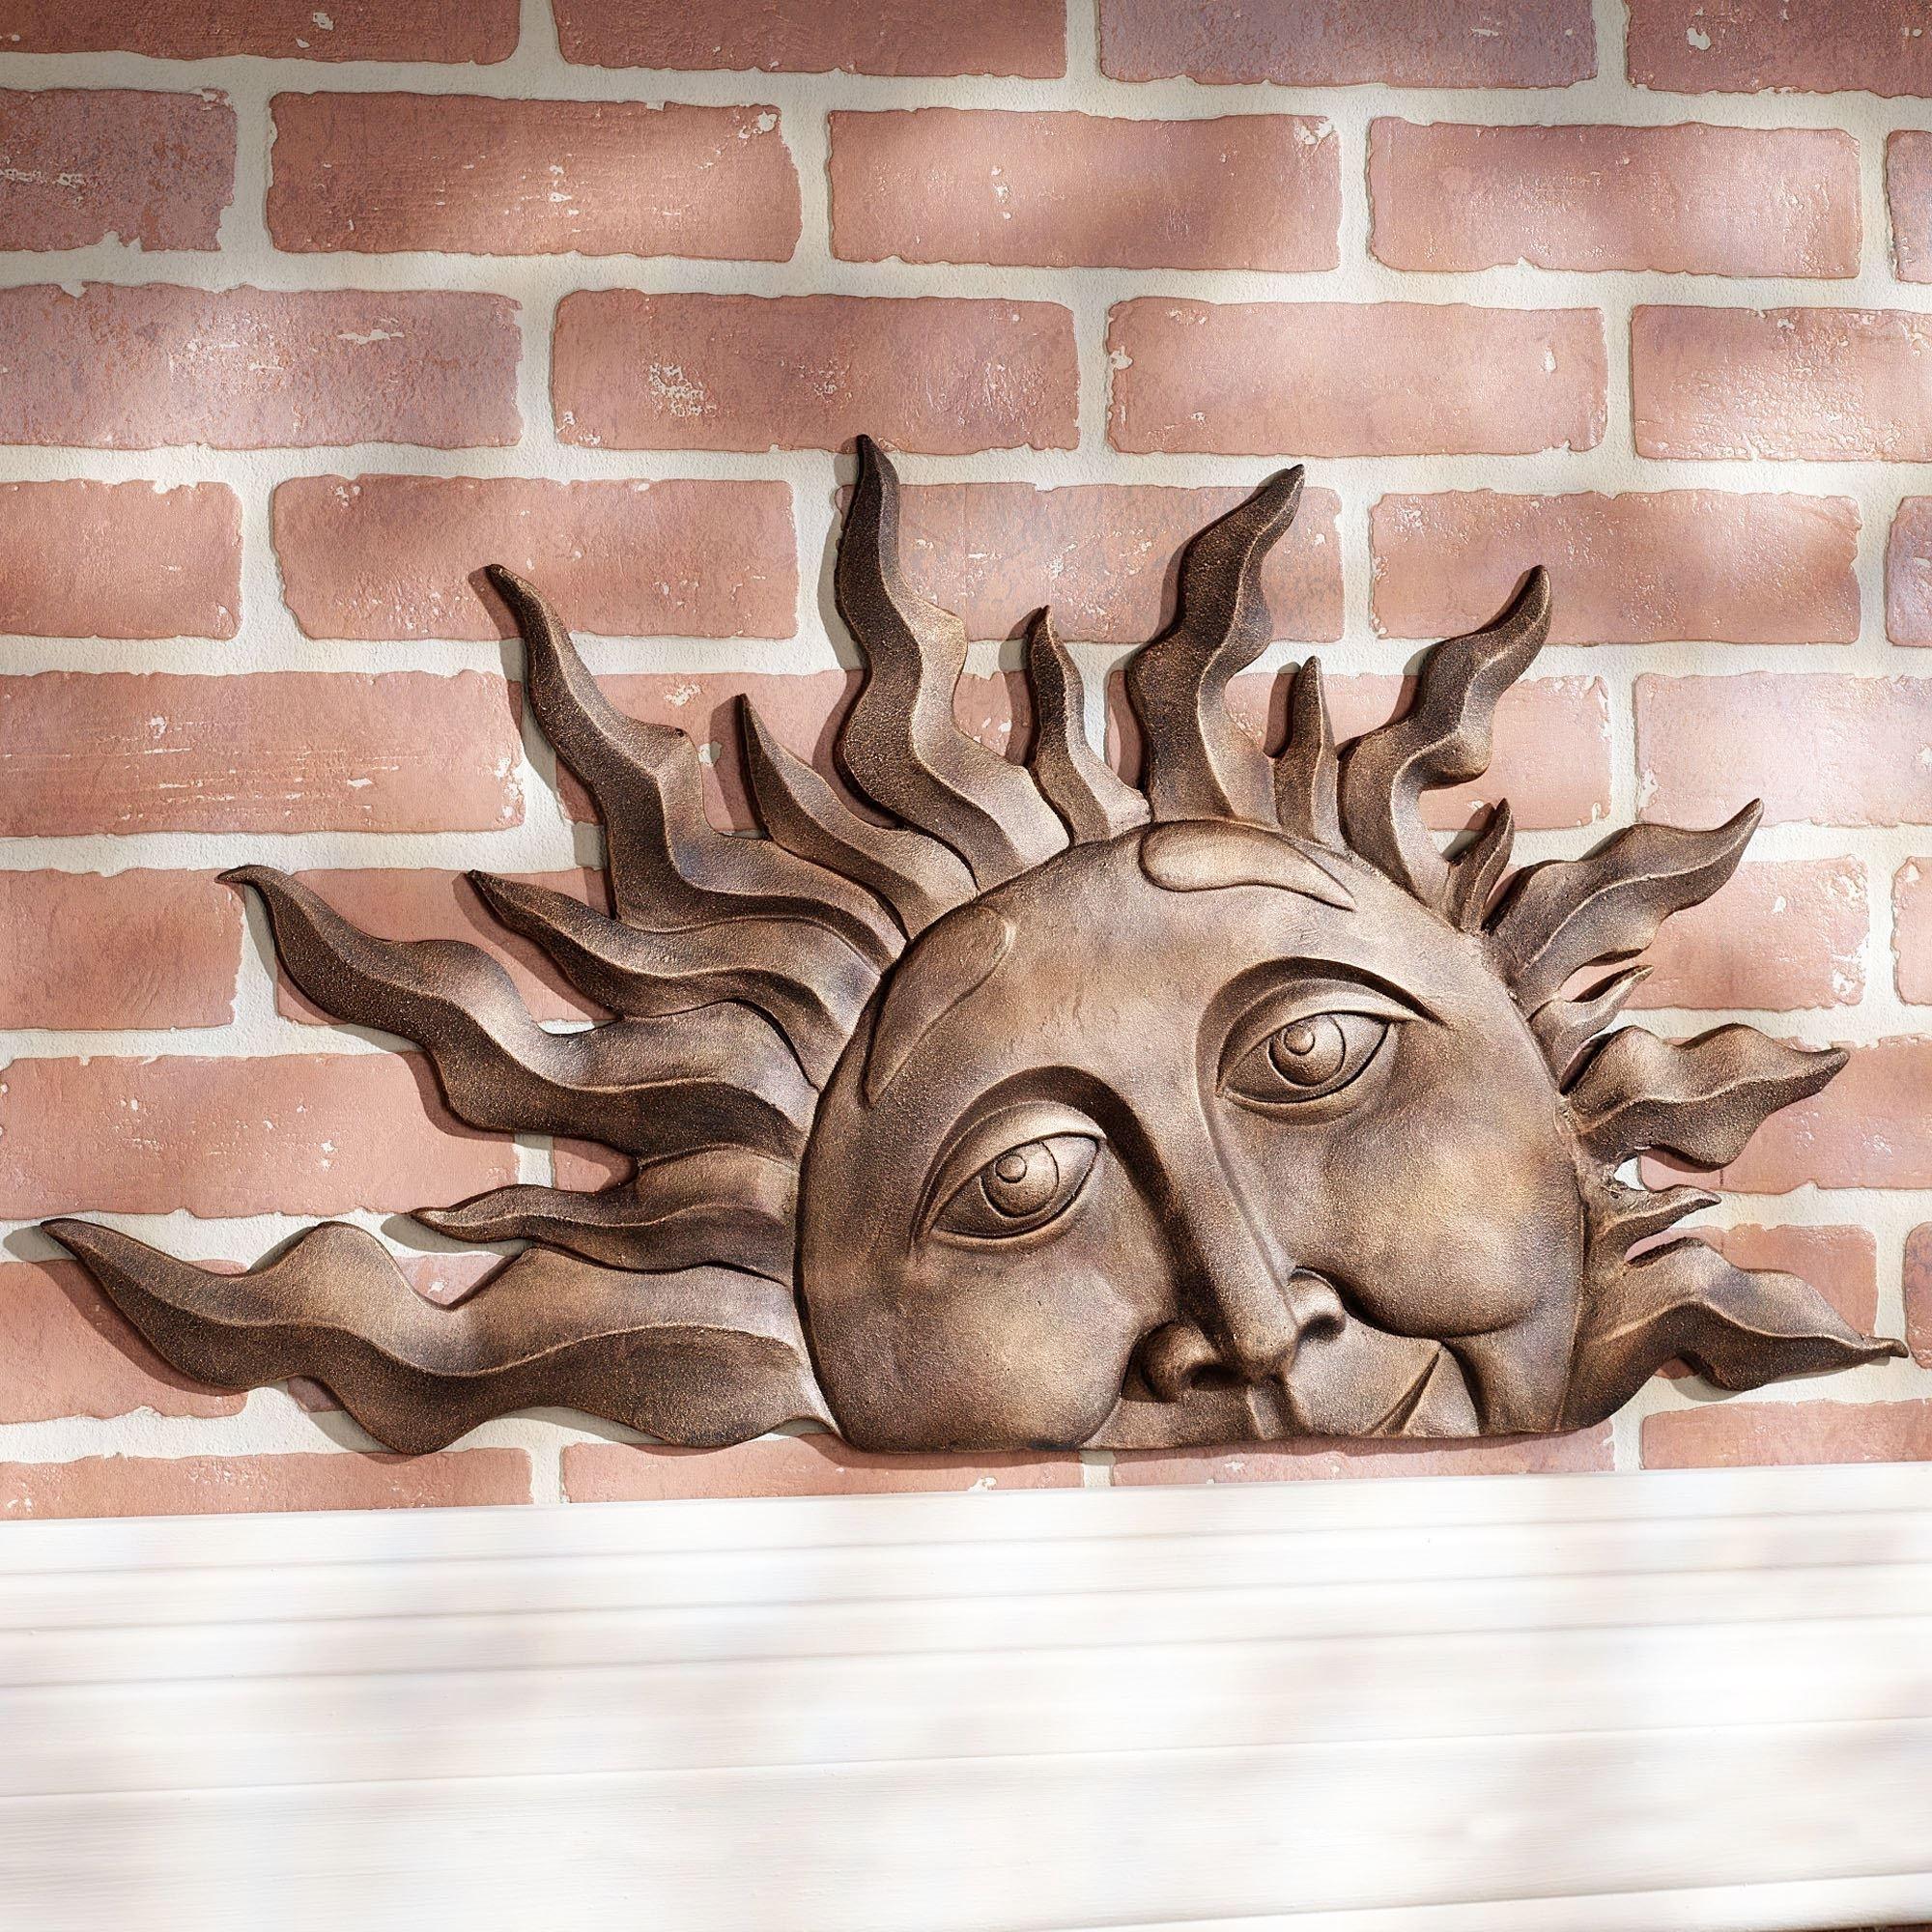 Half Sun Face Indoor Outdoor Metal Wall Plaque Art Within Best And Newest Outdoor Sun Wall Art (Gallery 10 of 15)